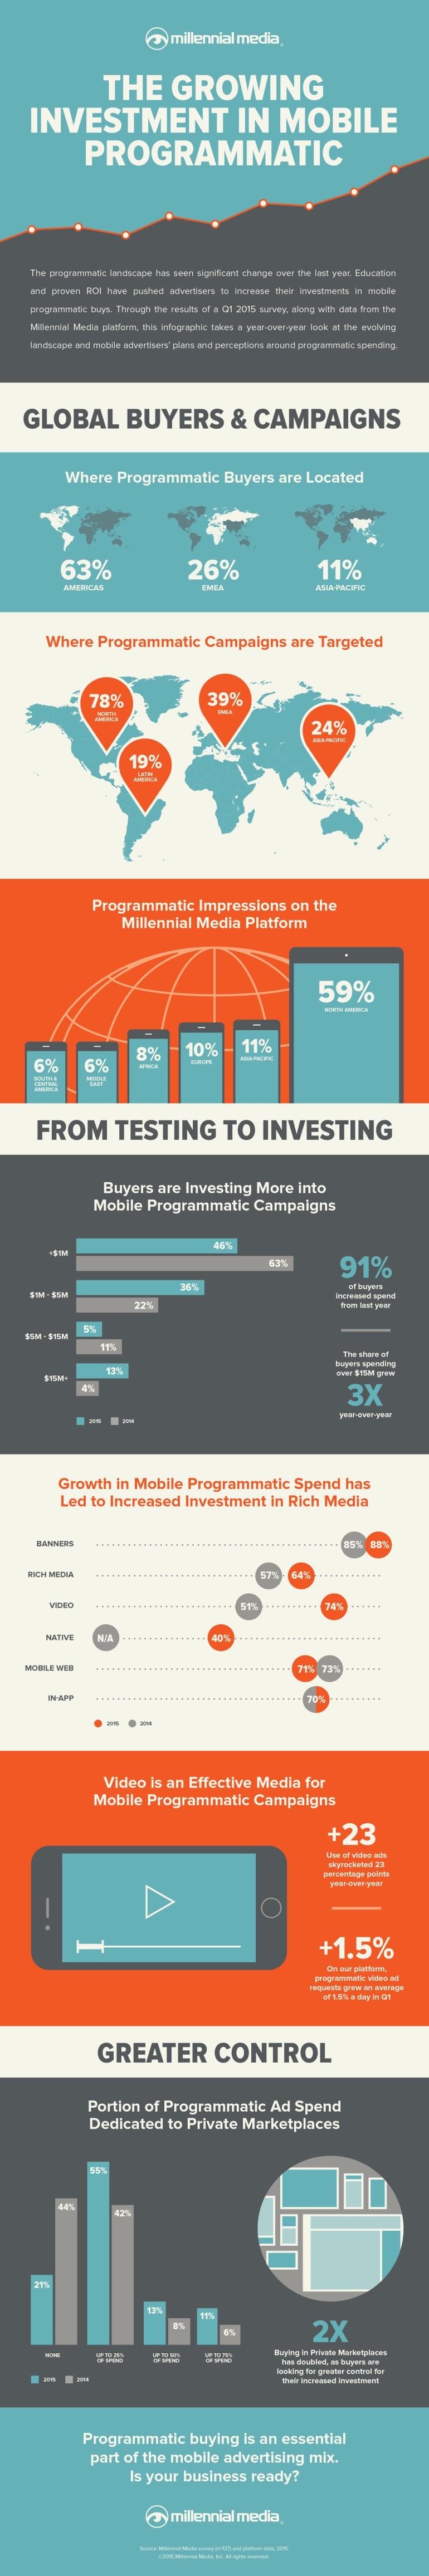 Programmatic-Infographic-2015-Pt1-v2d